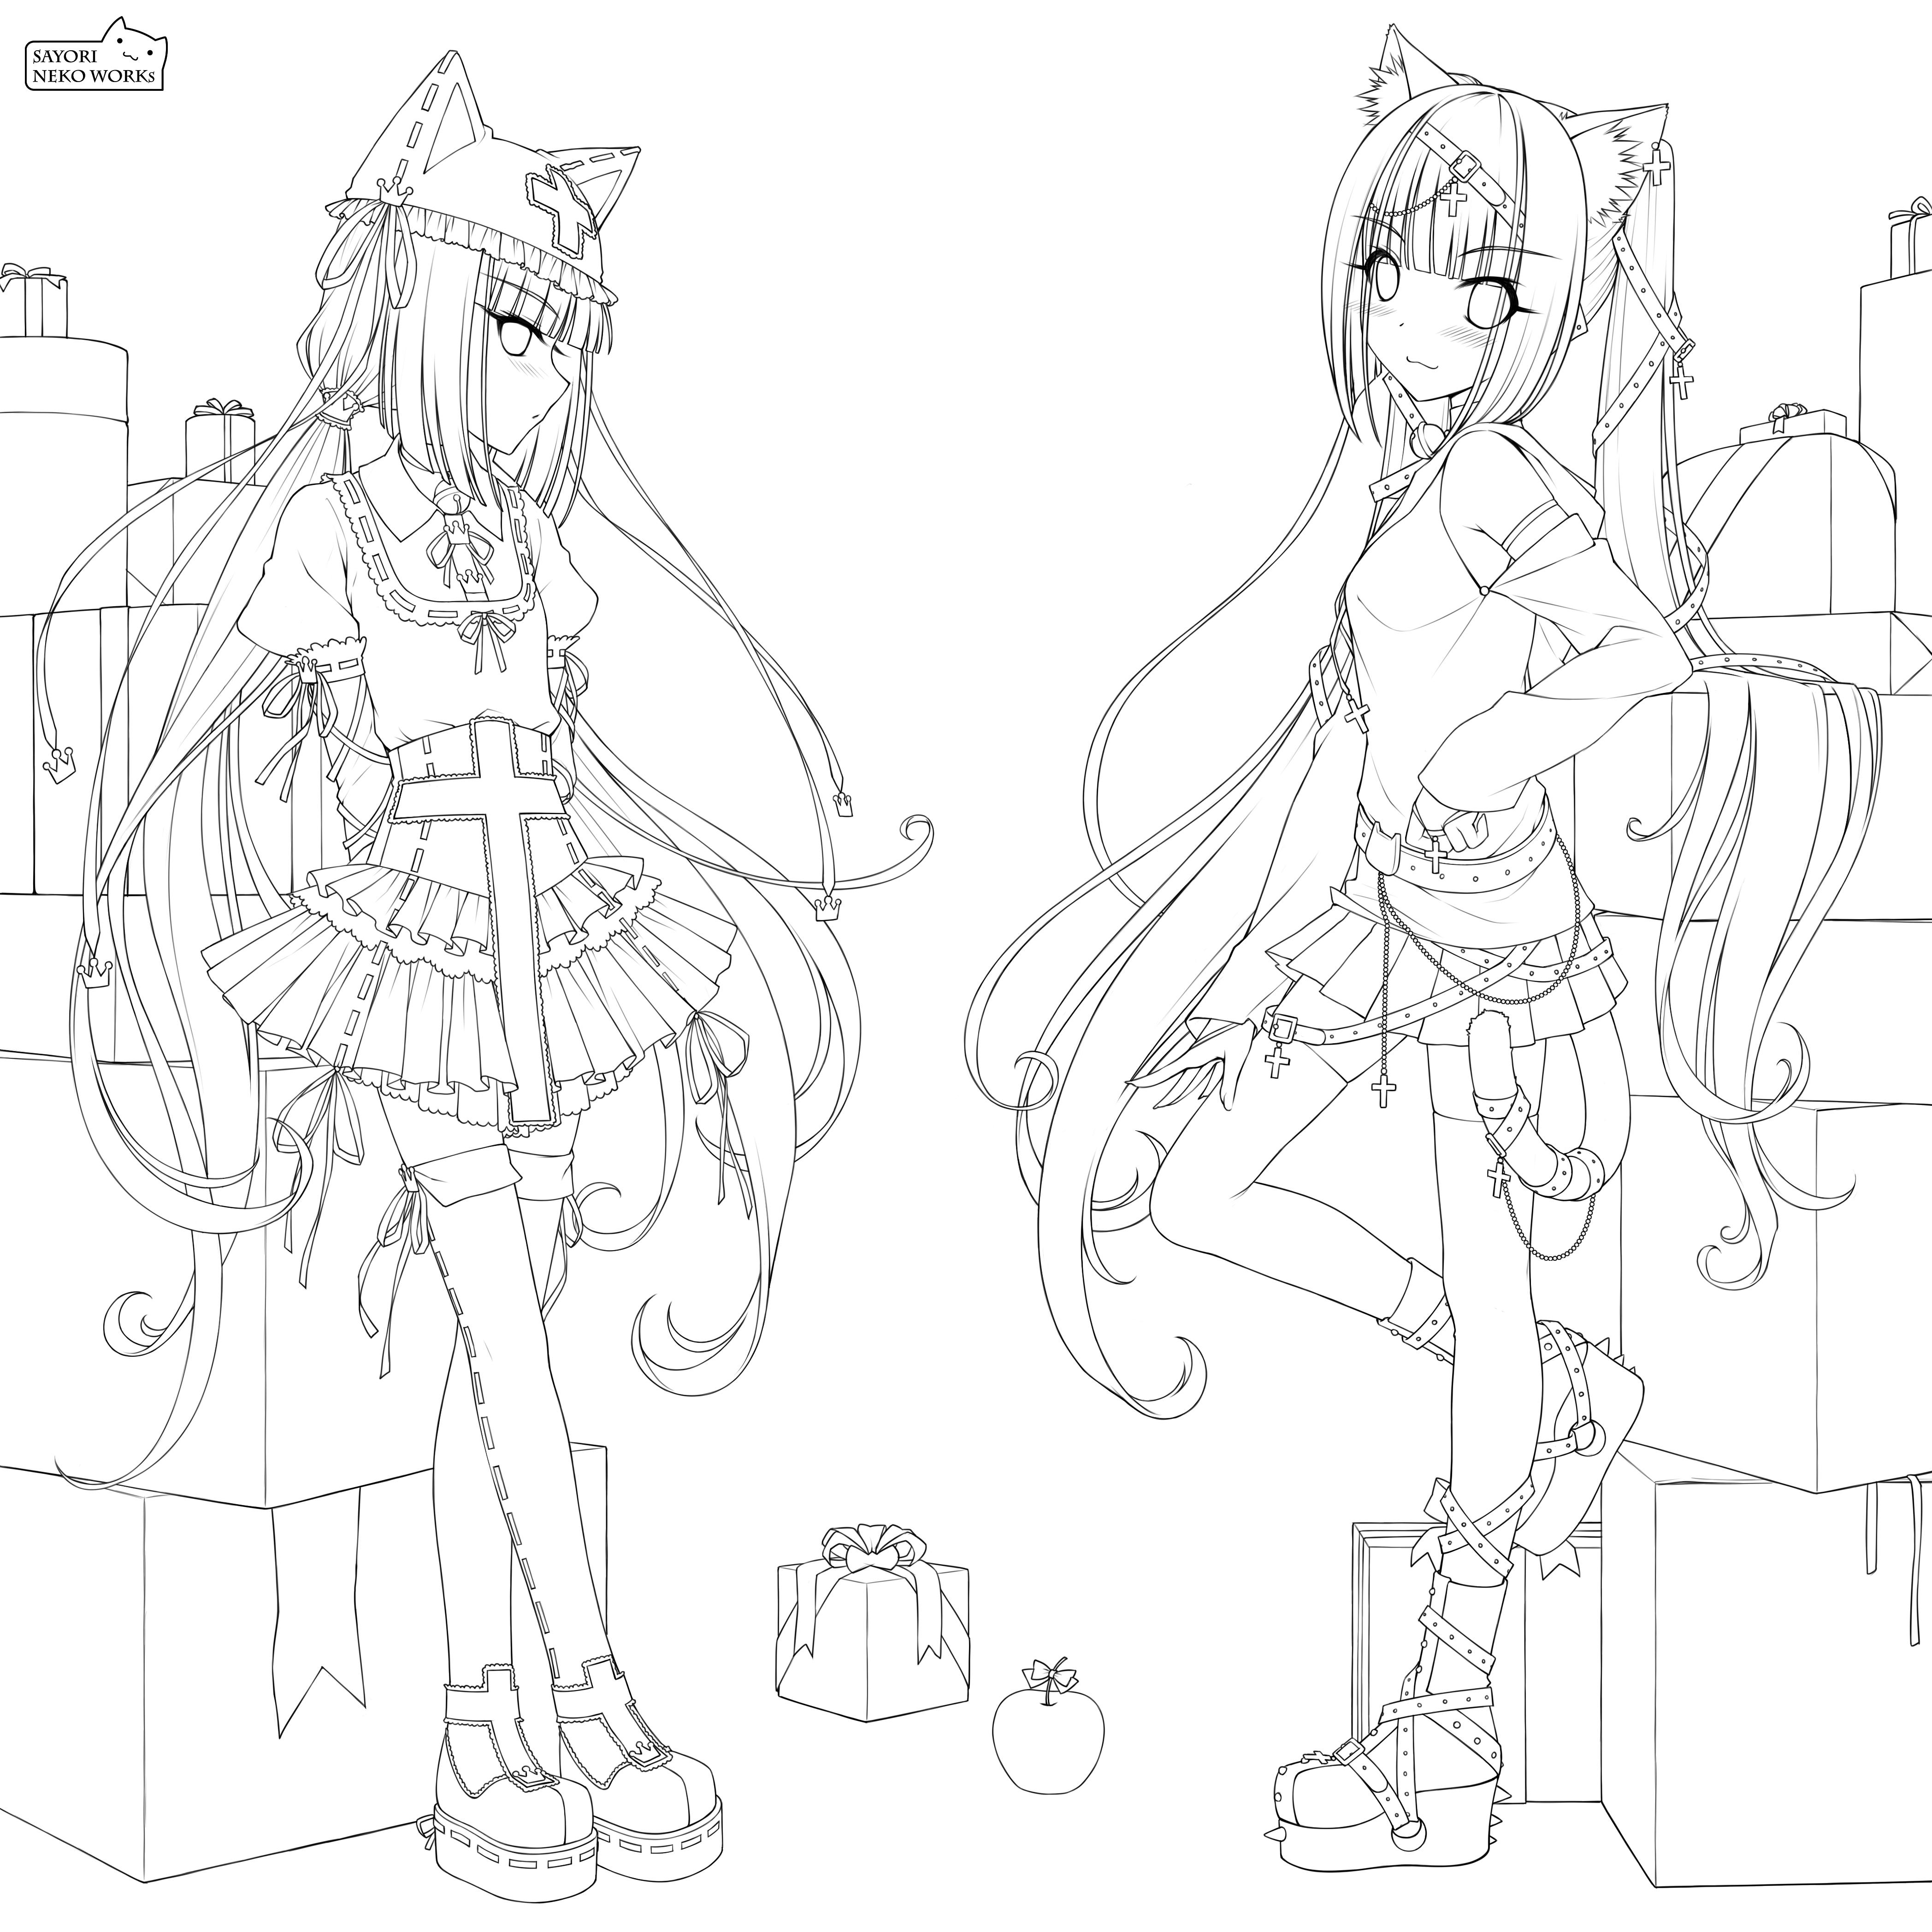 Zerochan Lineart : Sayori image  zerochan anime board